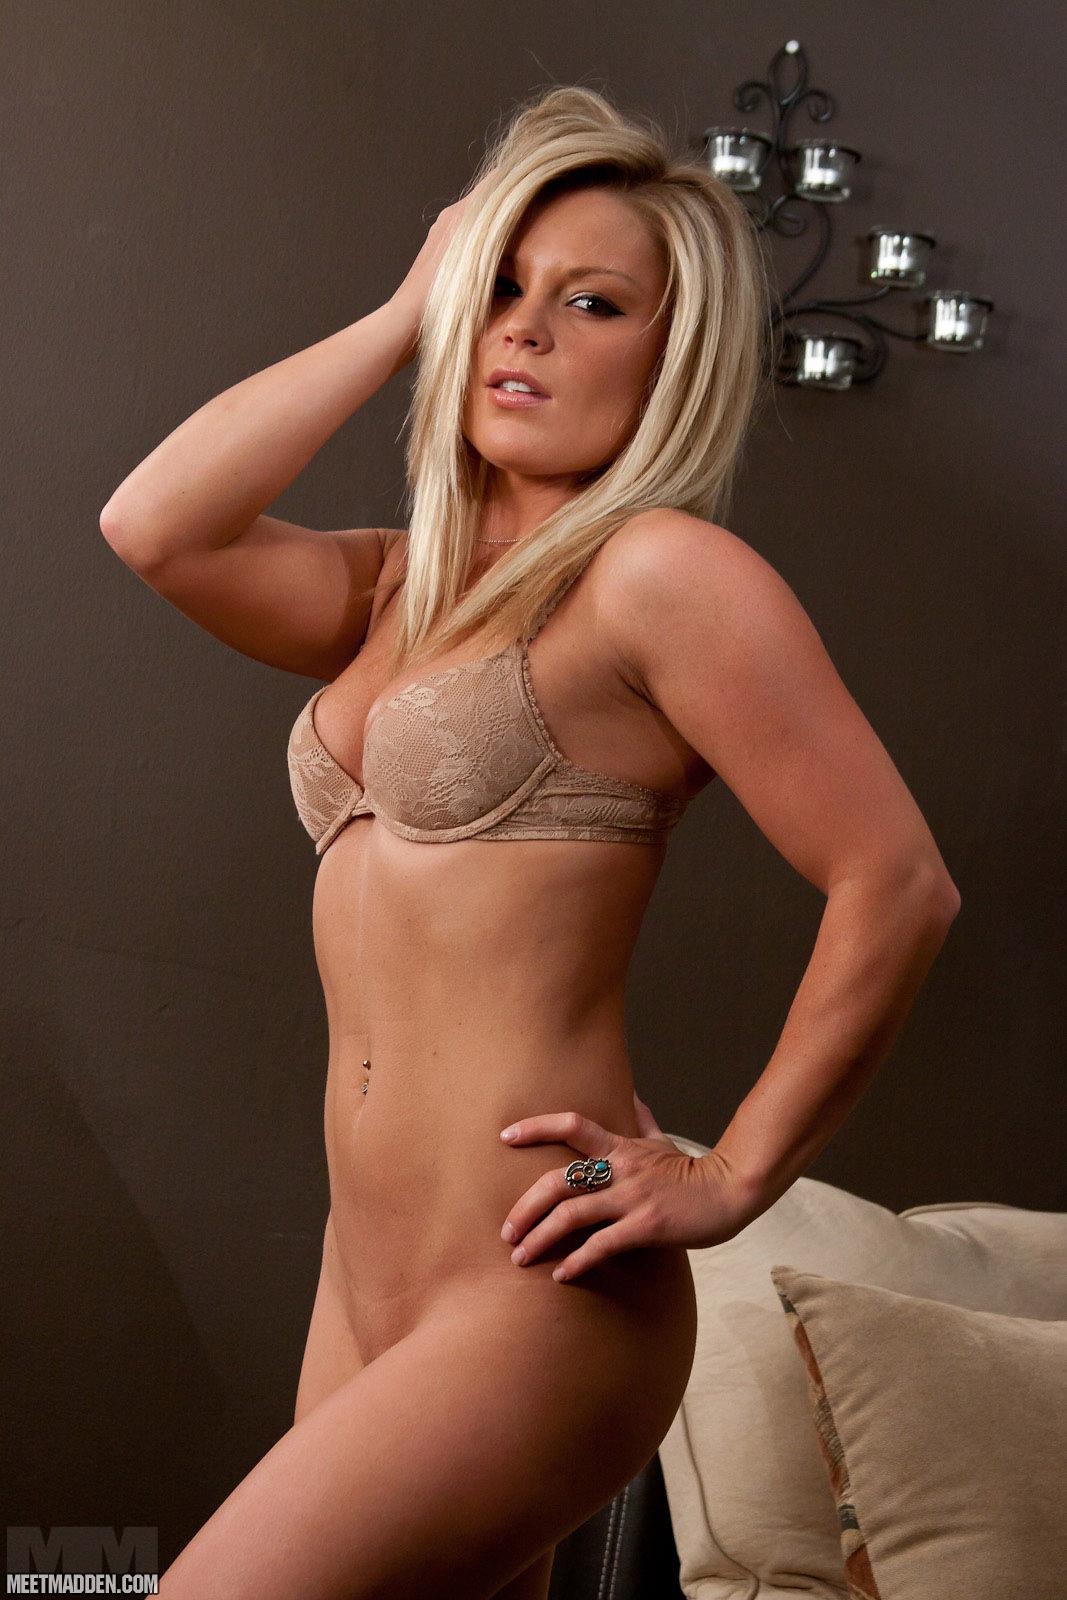 hot nude meet madden cowgirl